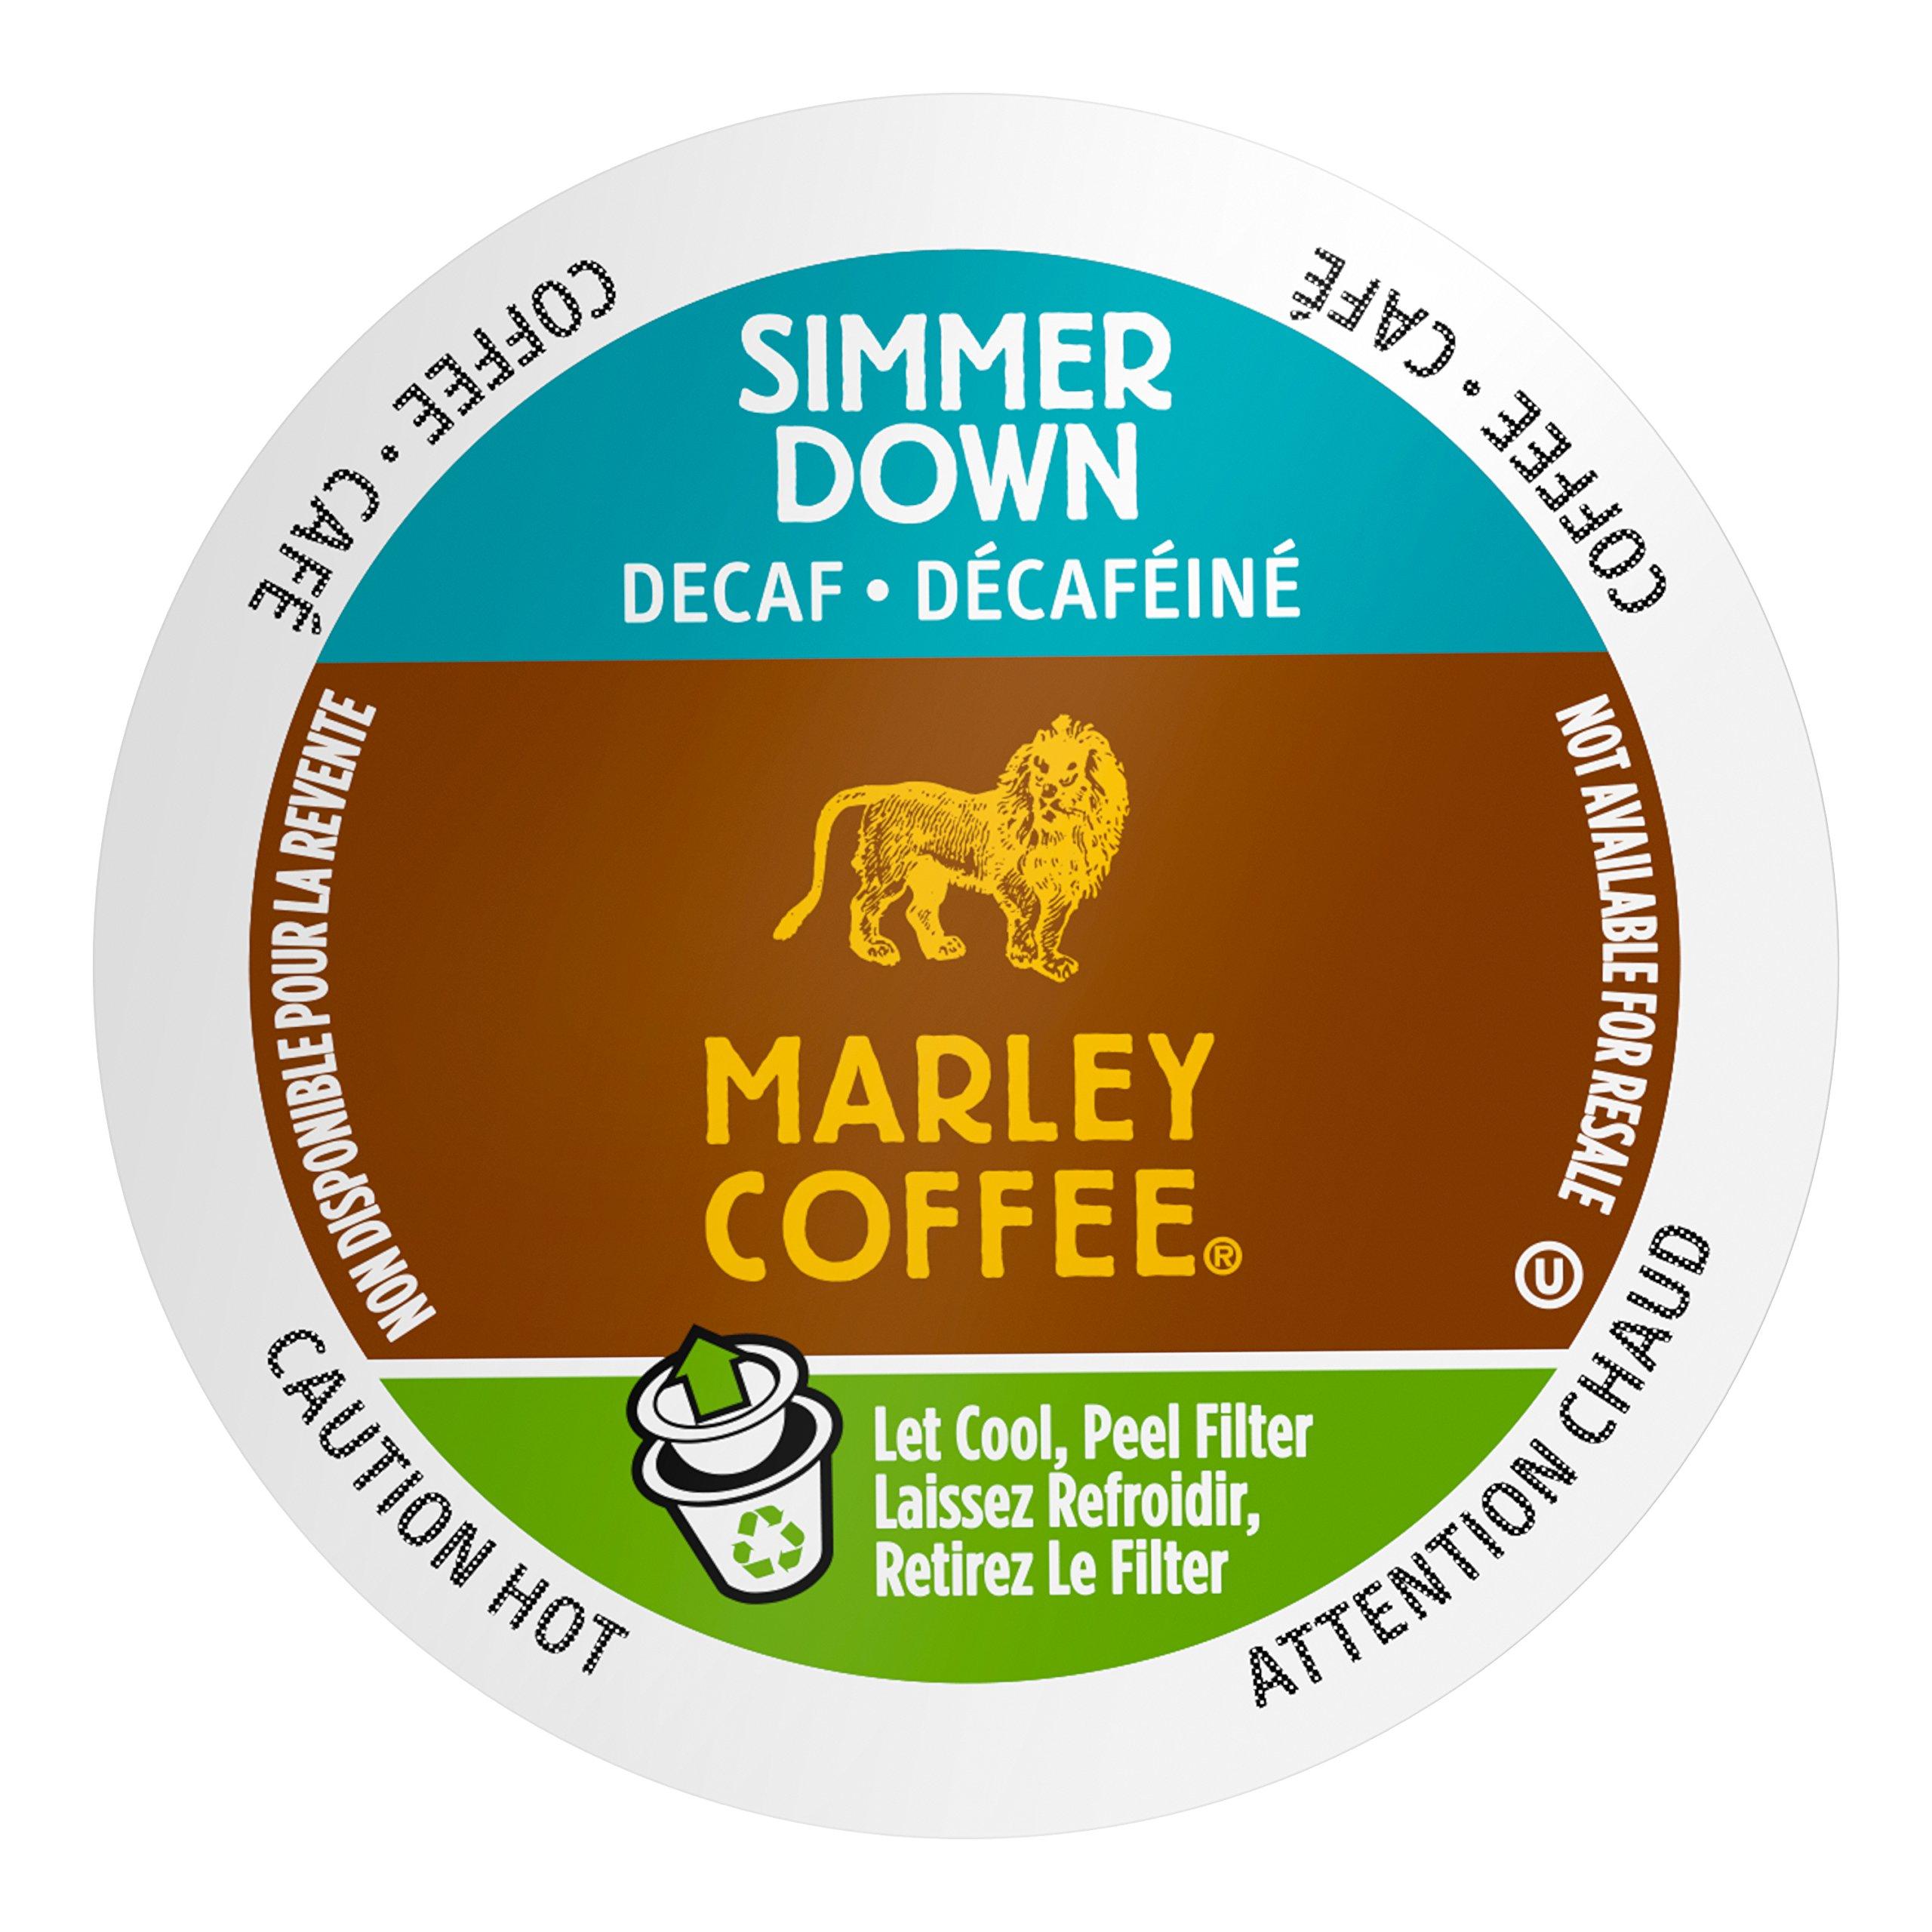 Marley Coffee Simmer Down Coffee, Decaffeinated, 24 Count